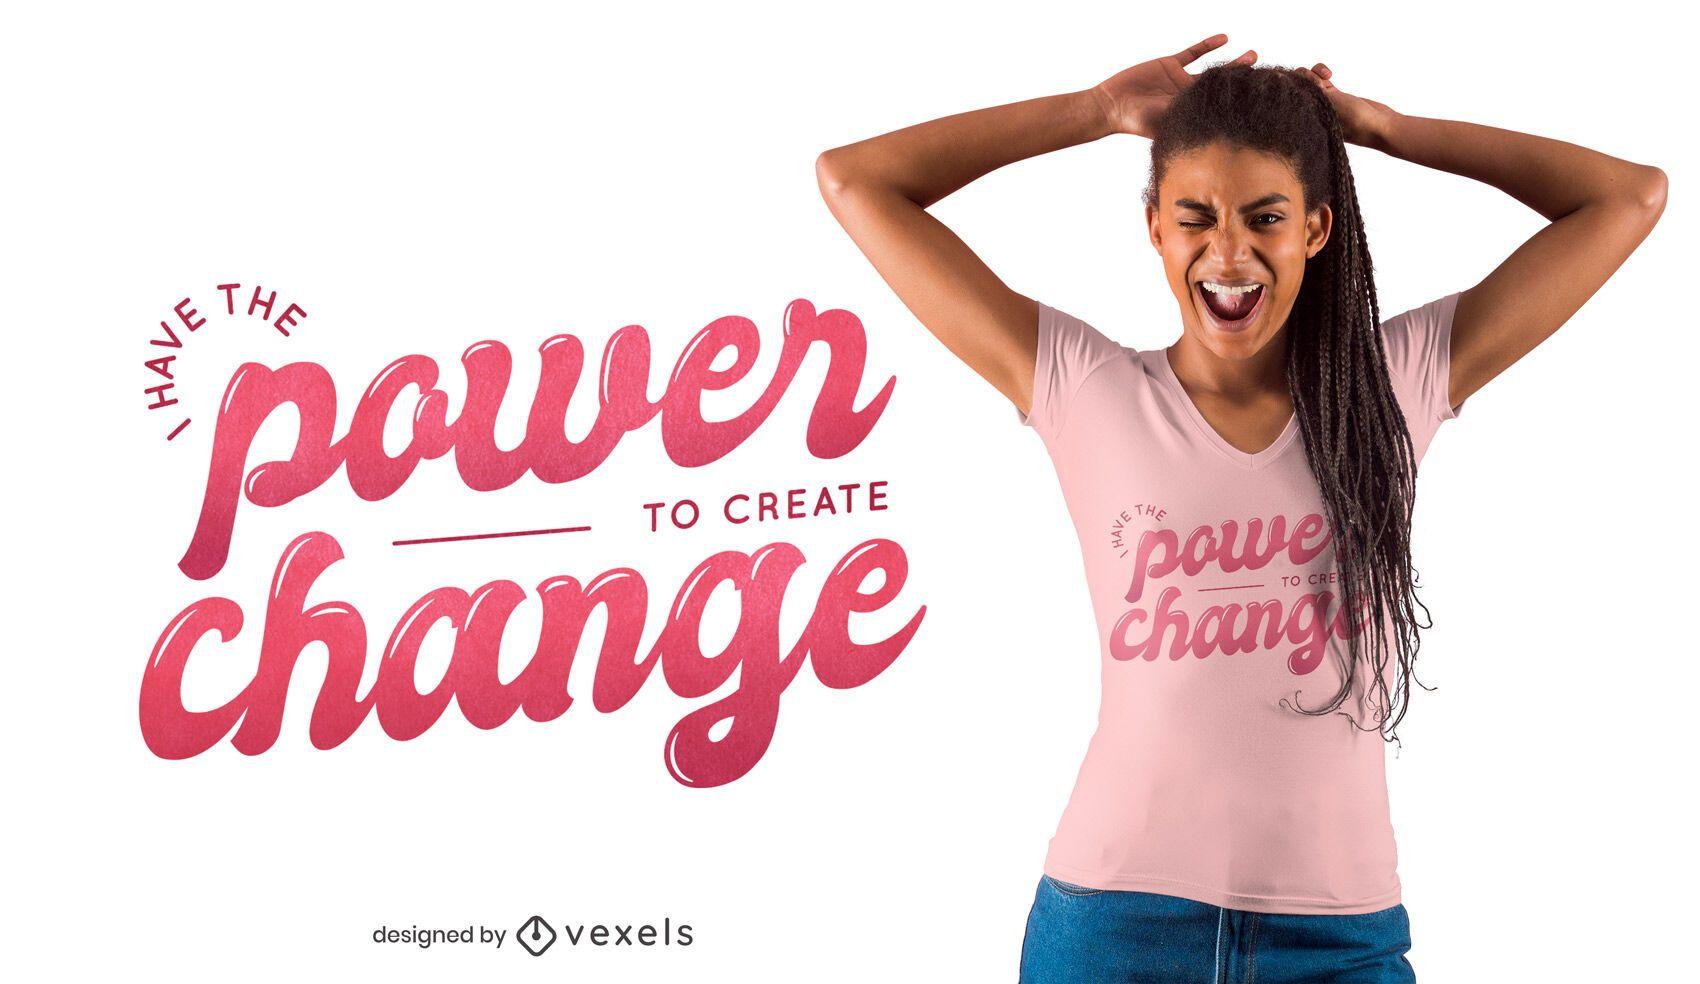 Power change t-shirt design